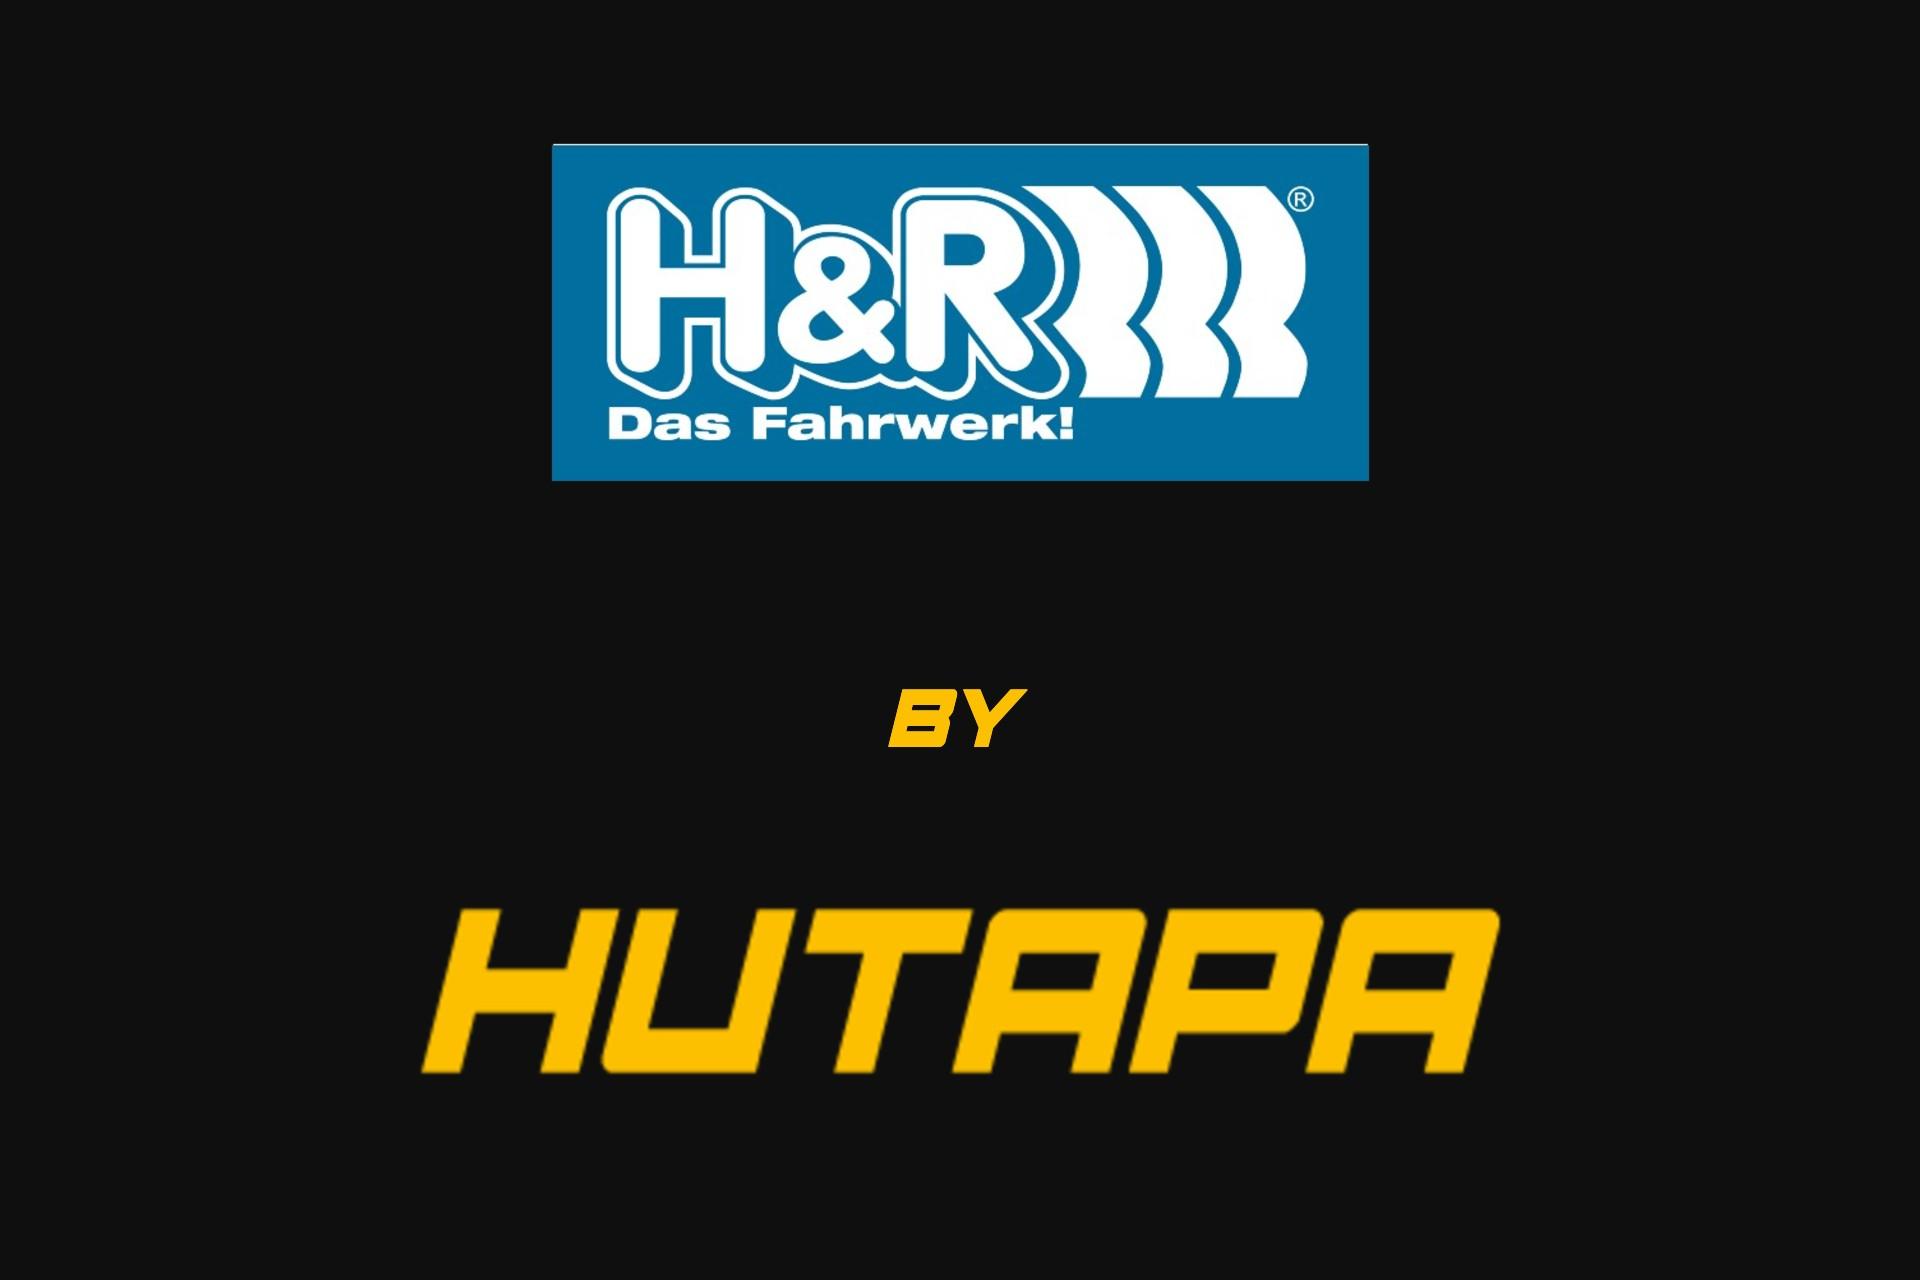 H&R - Autogarage Hutapa